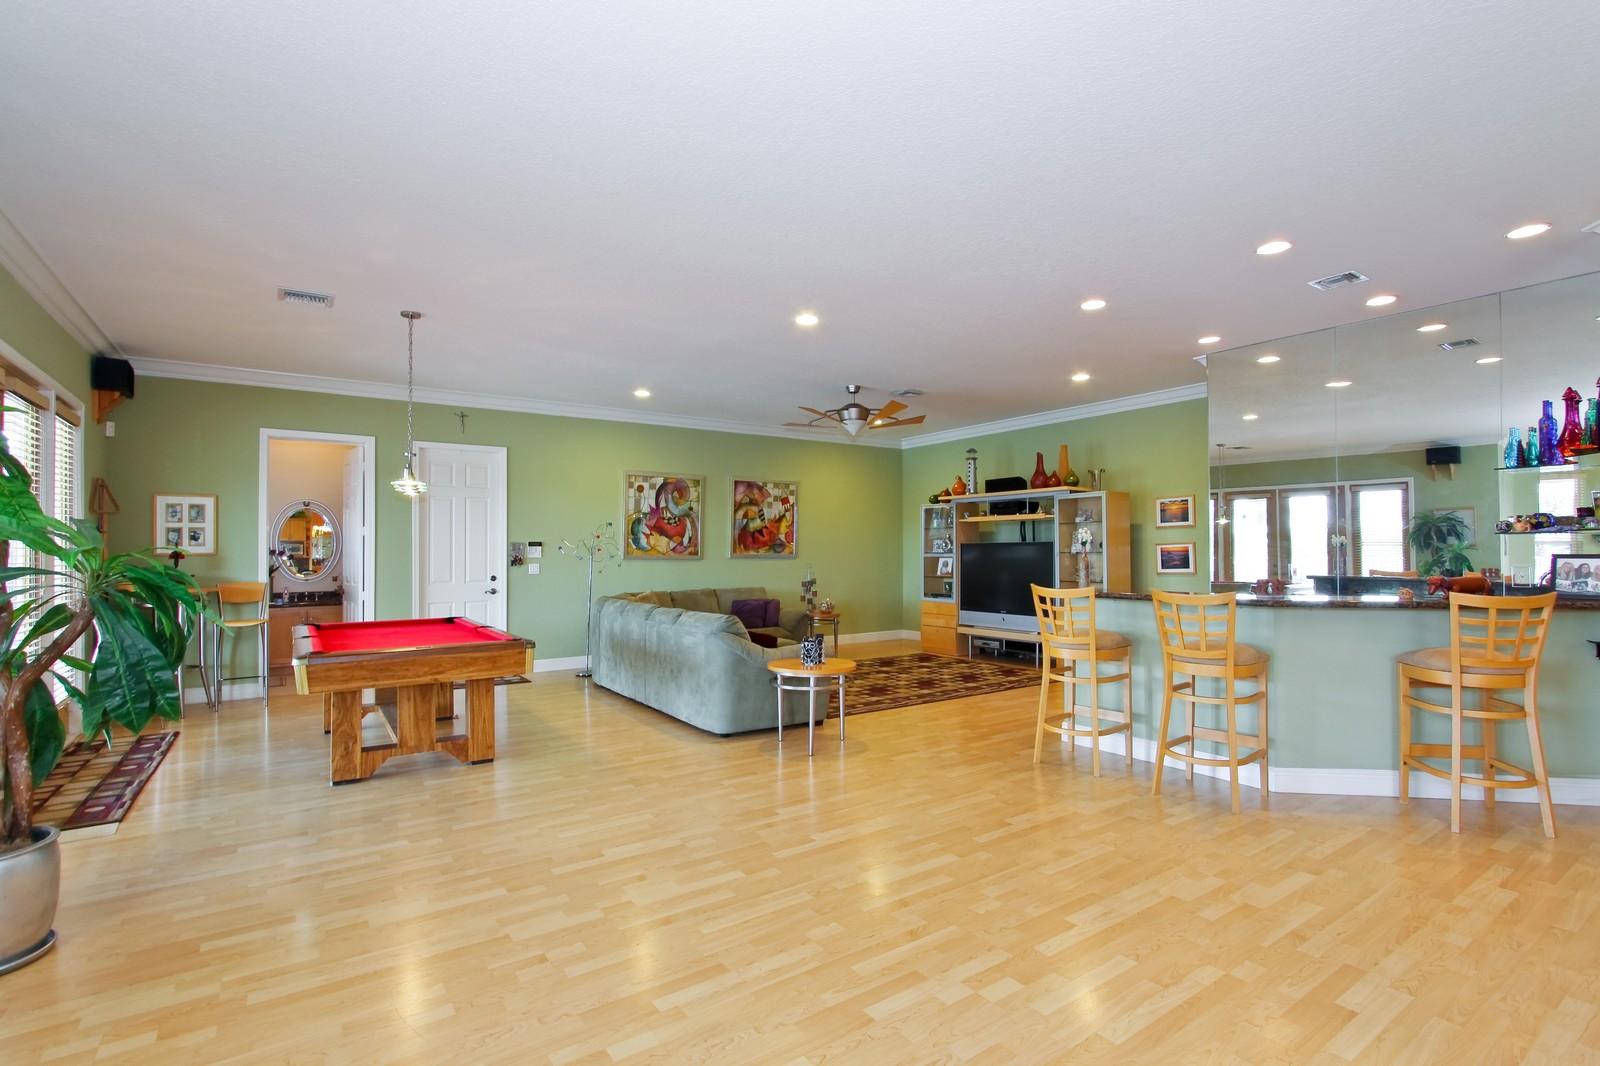 Real Estate Photography - 14542 Draft Horse Ln, Wellington, FL, 33414 - Family Room